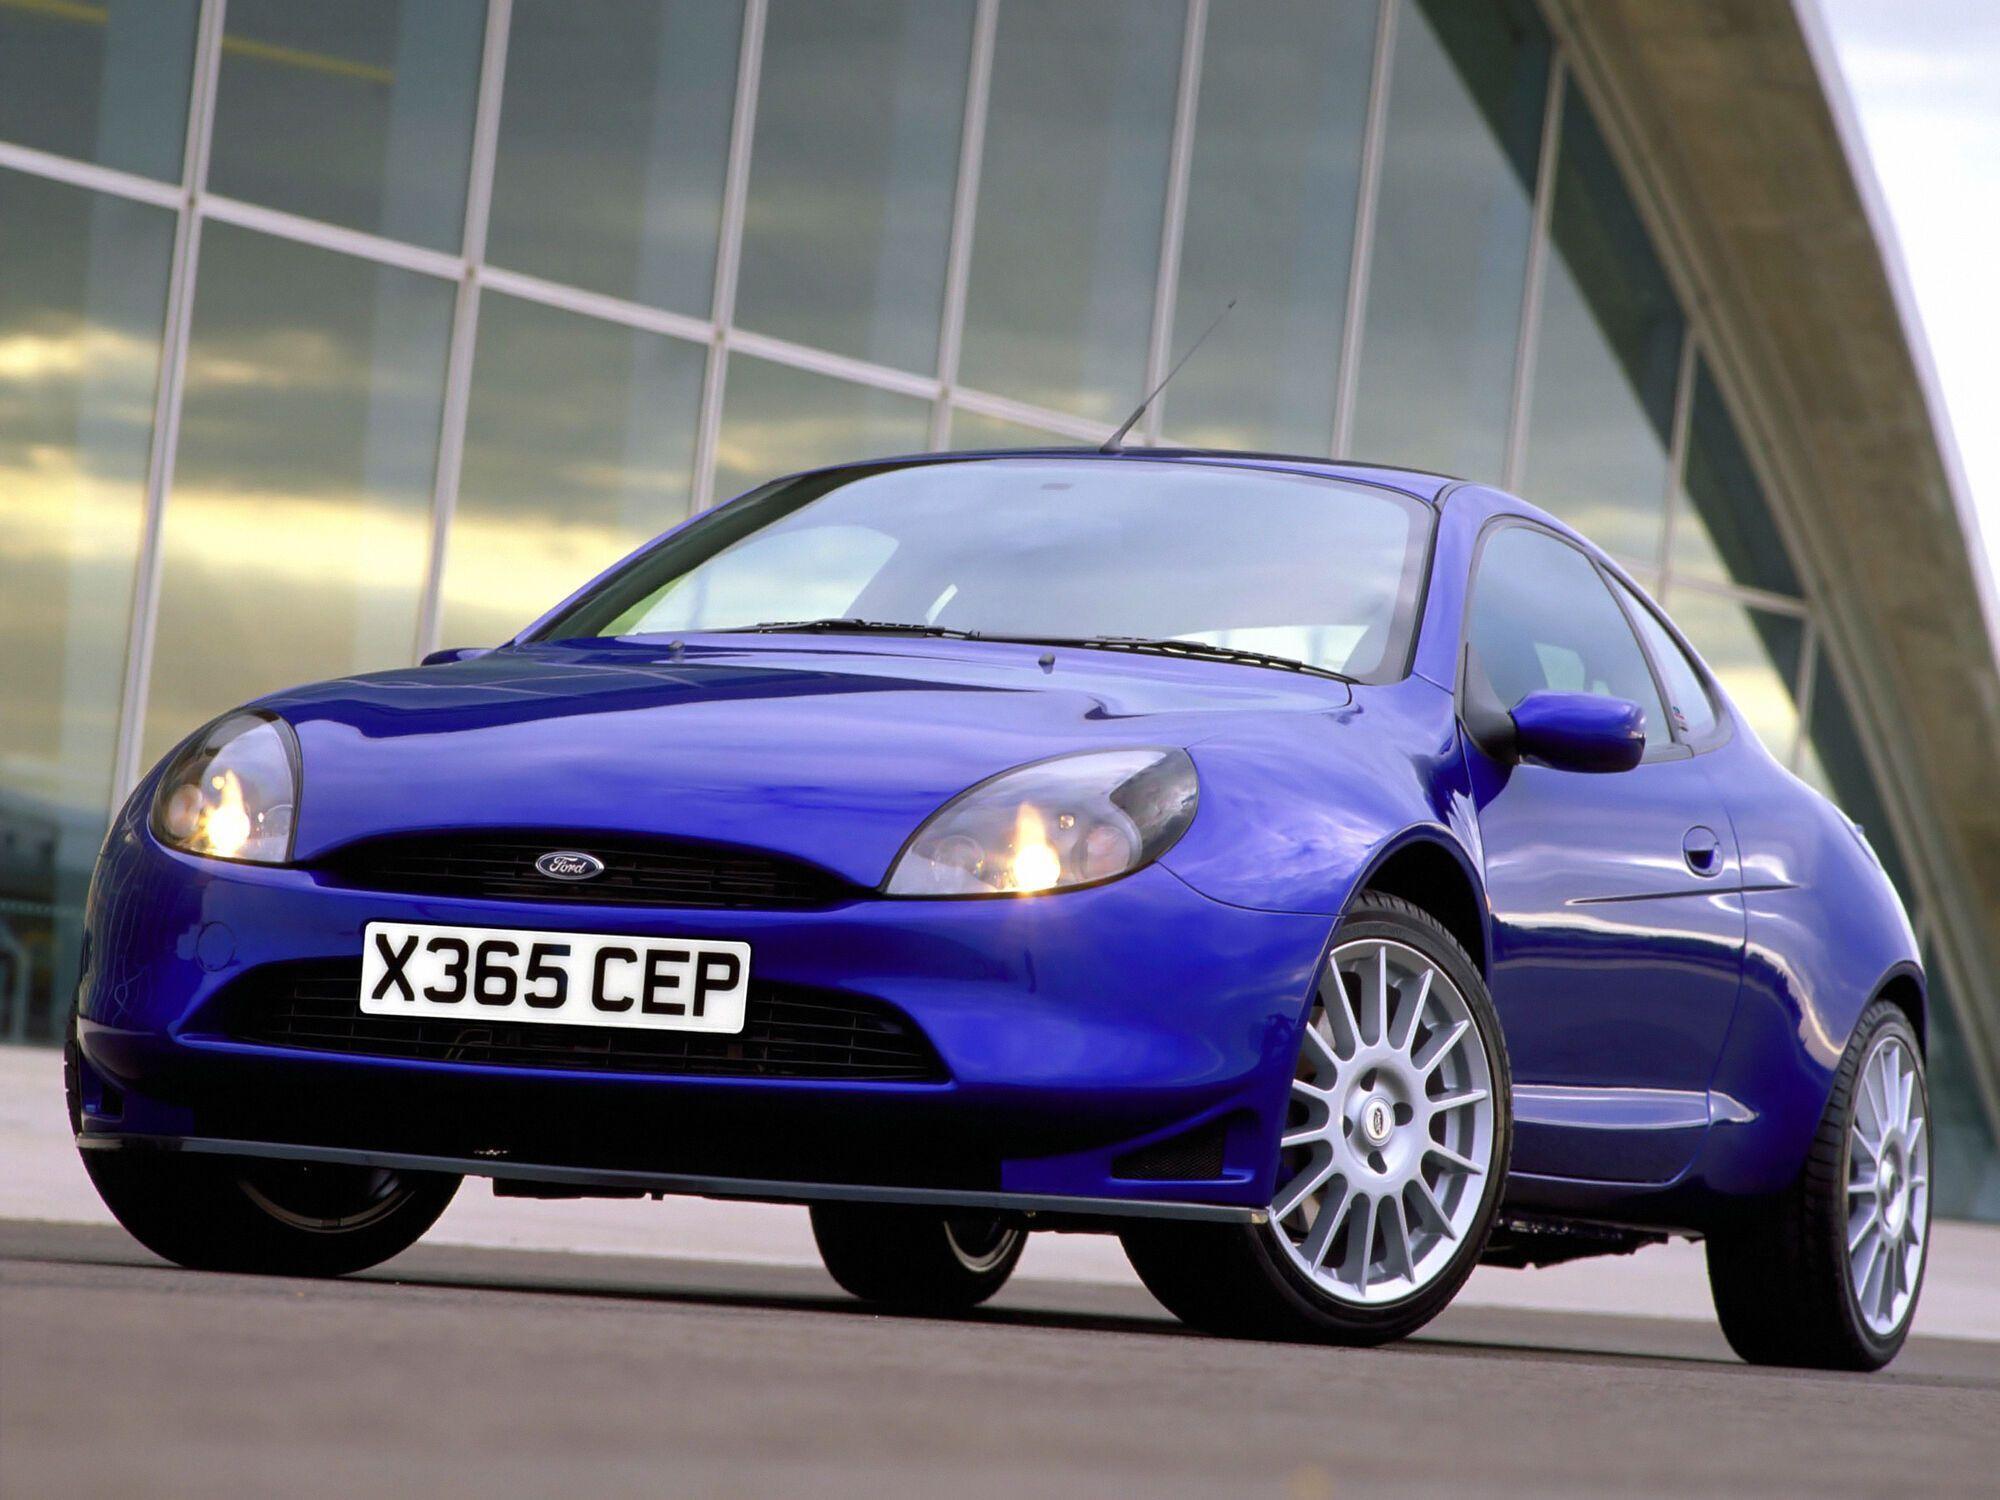 Купе Ford Puma выпускалось с 1997 по 2002 год